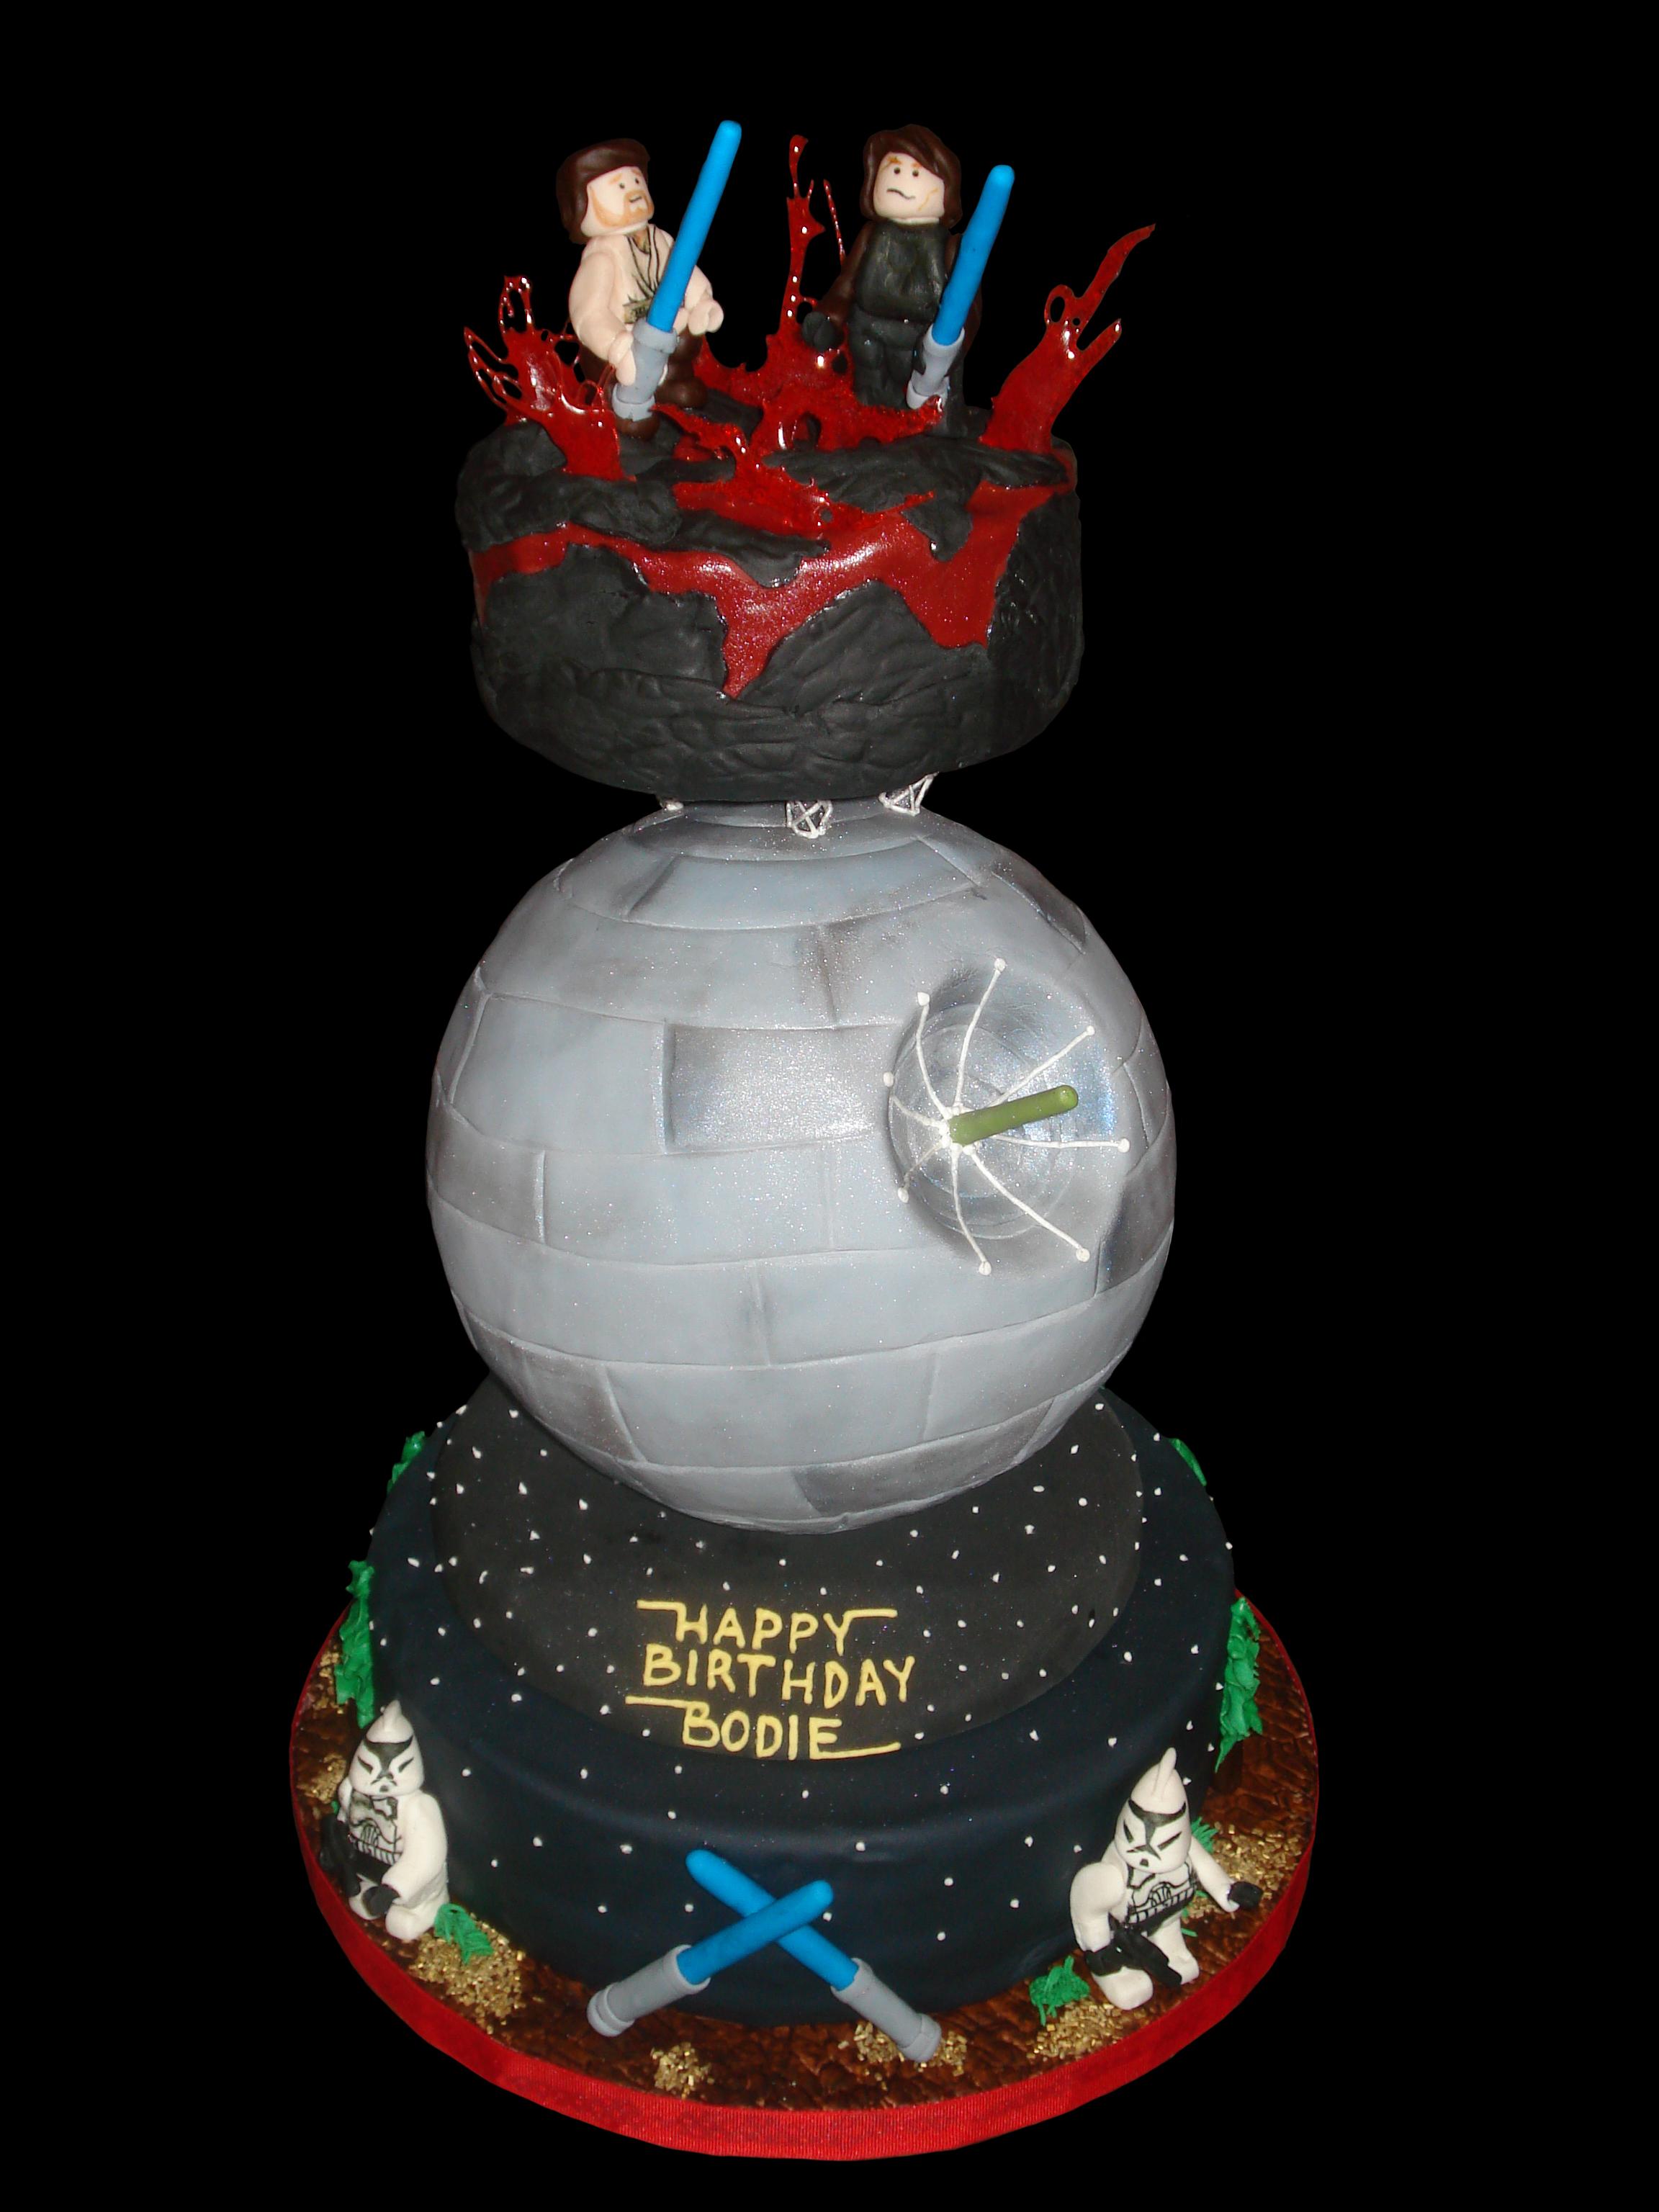 xCake Star Wars Lego.jpg